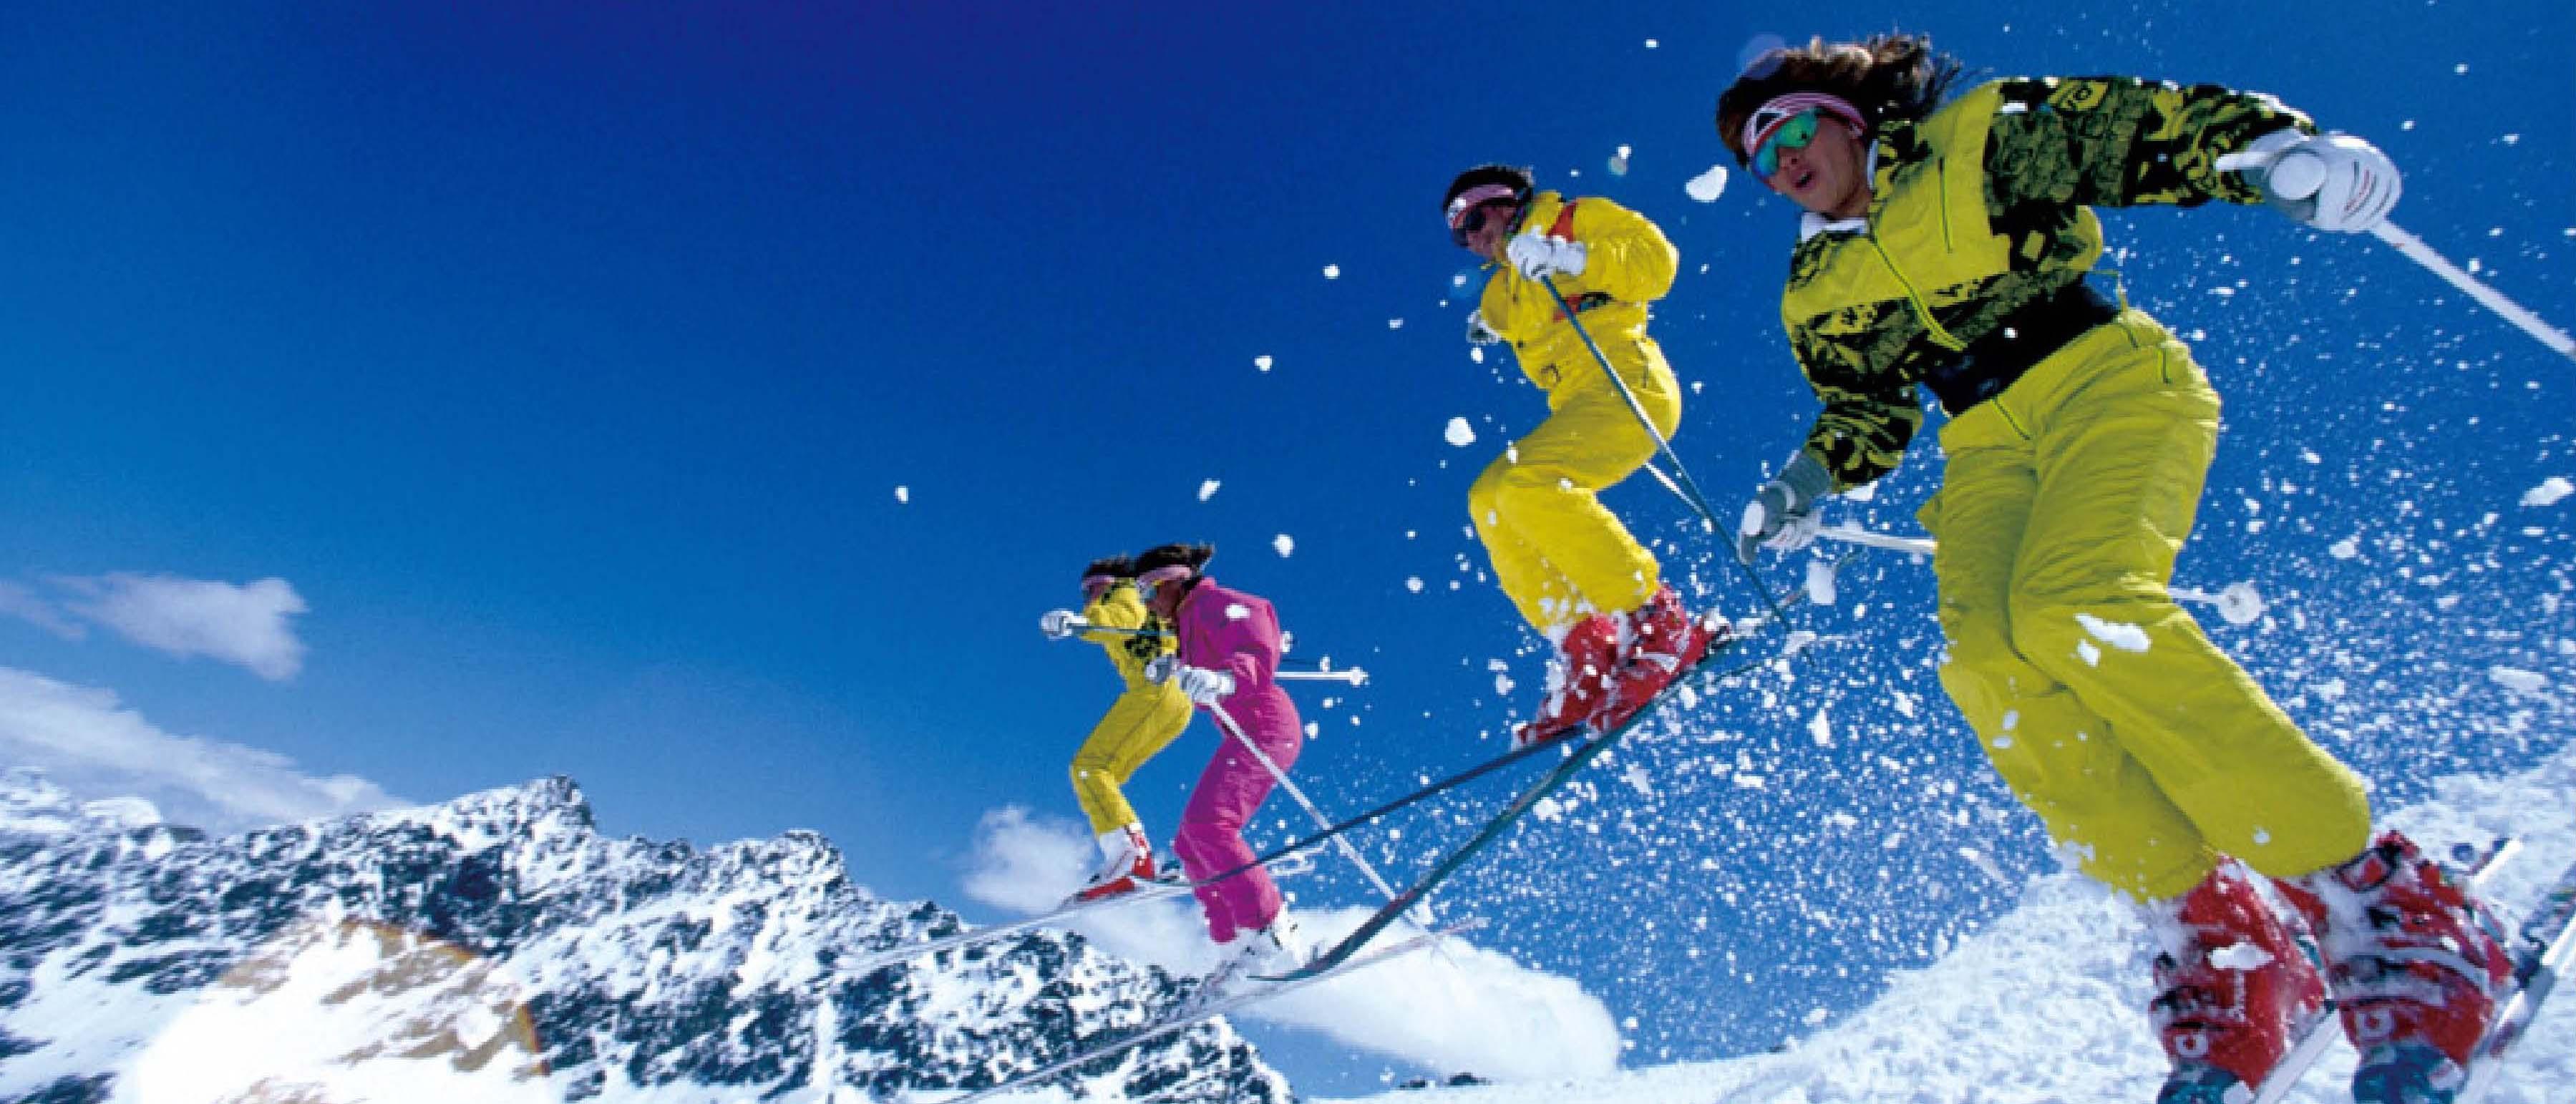 霞慕尼滑雪场